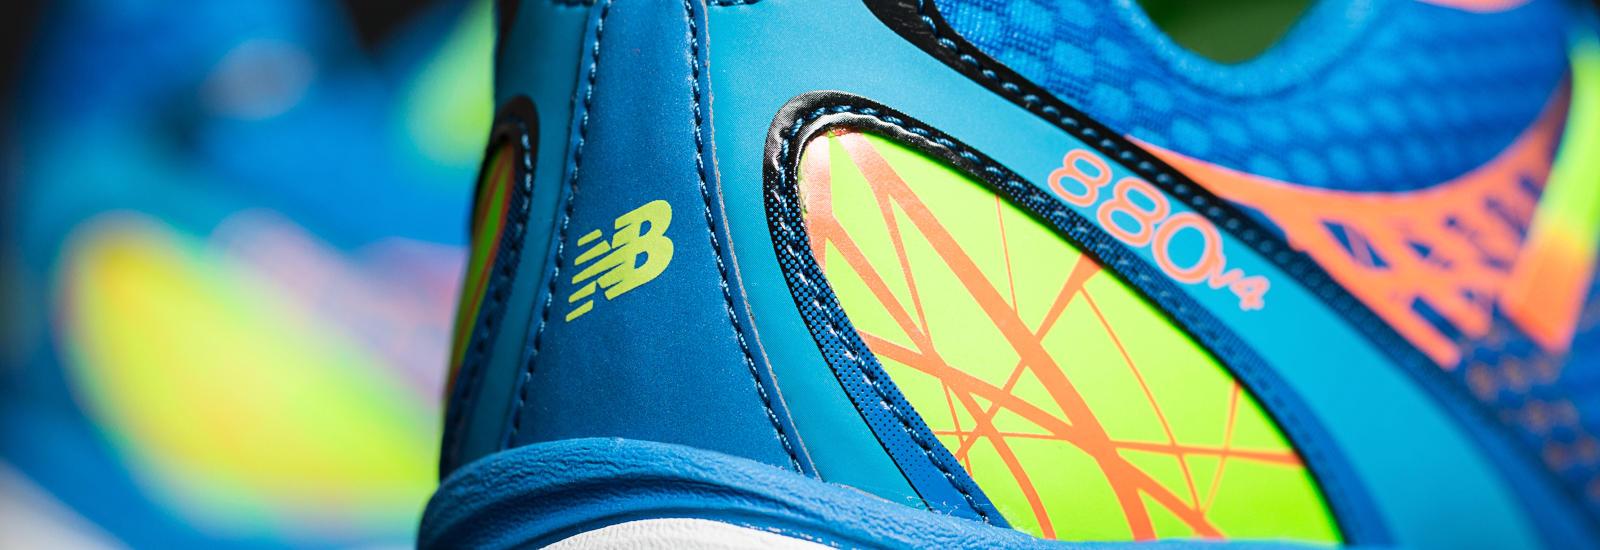 new balance 880v4 blue